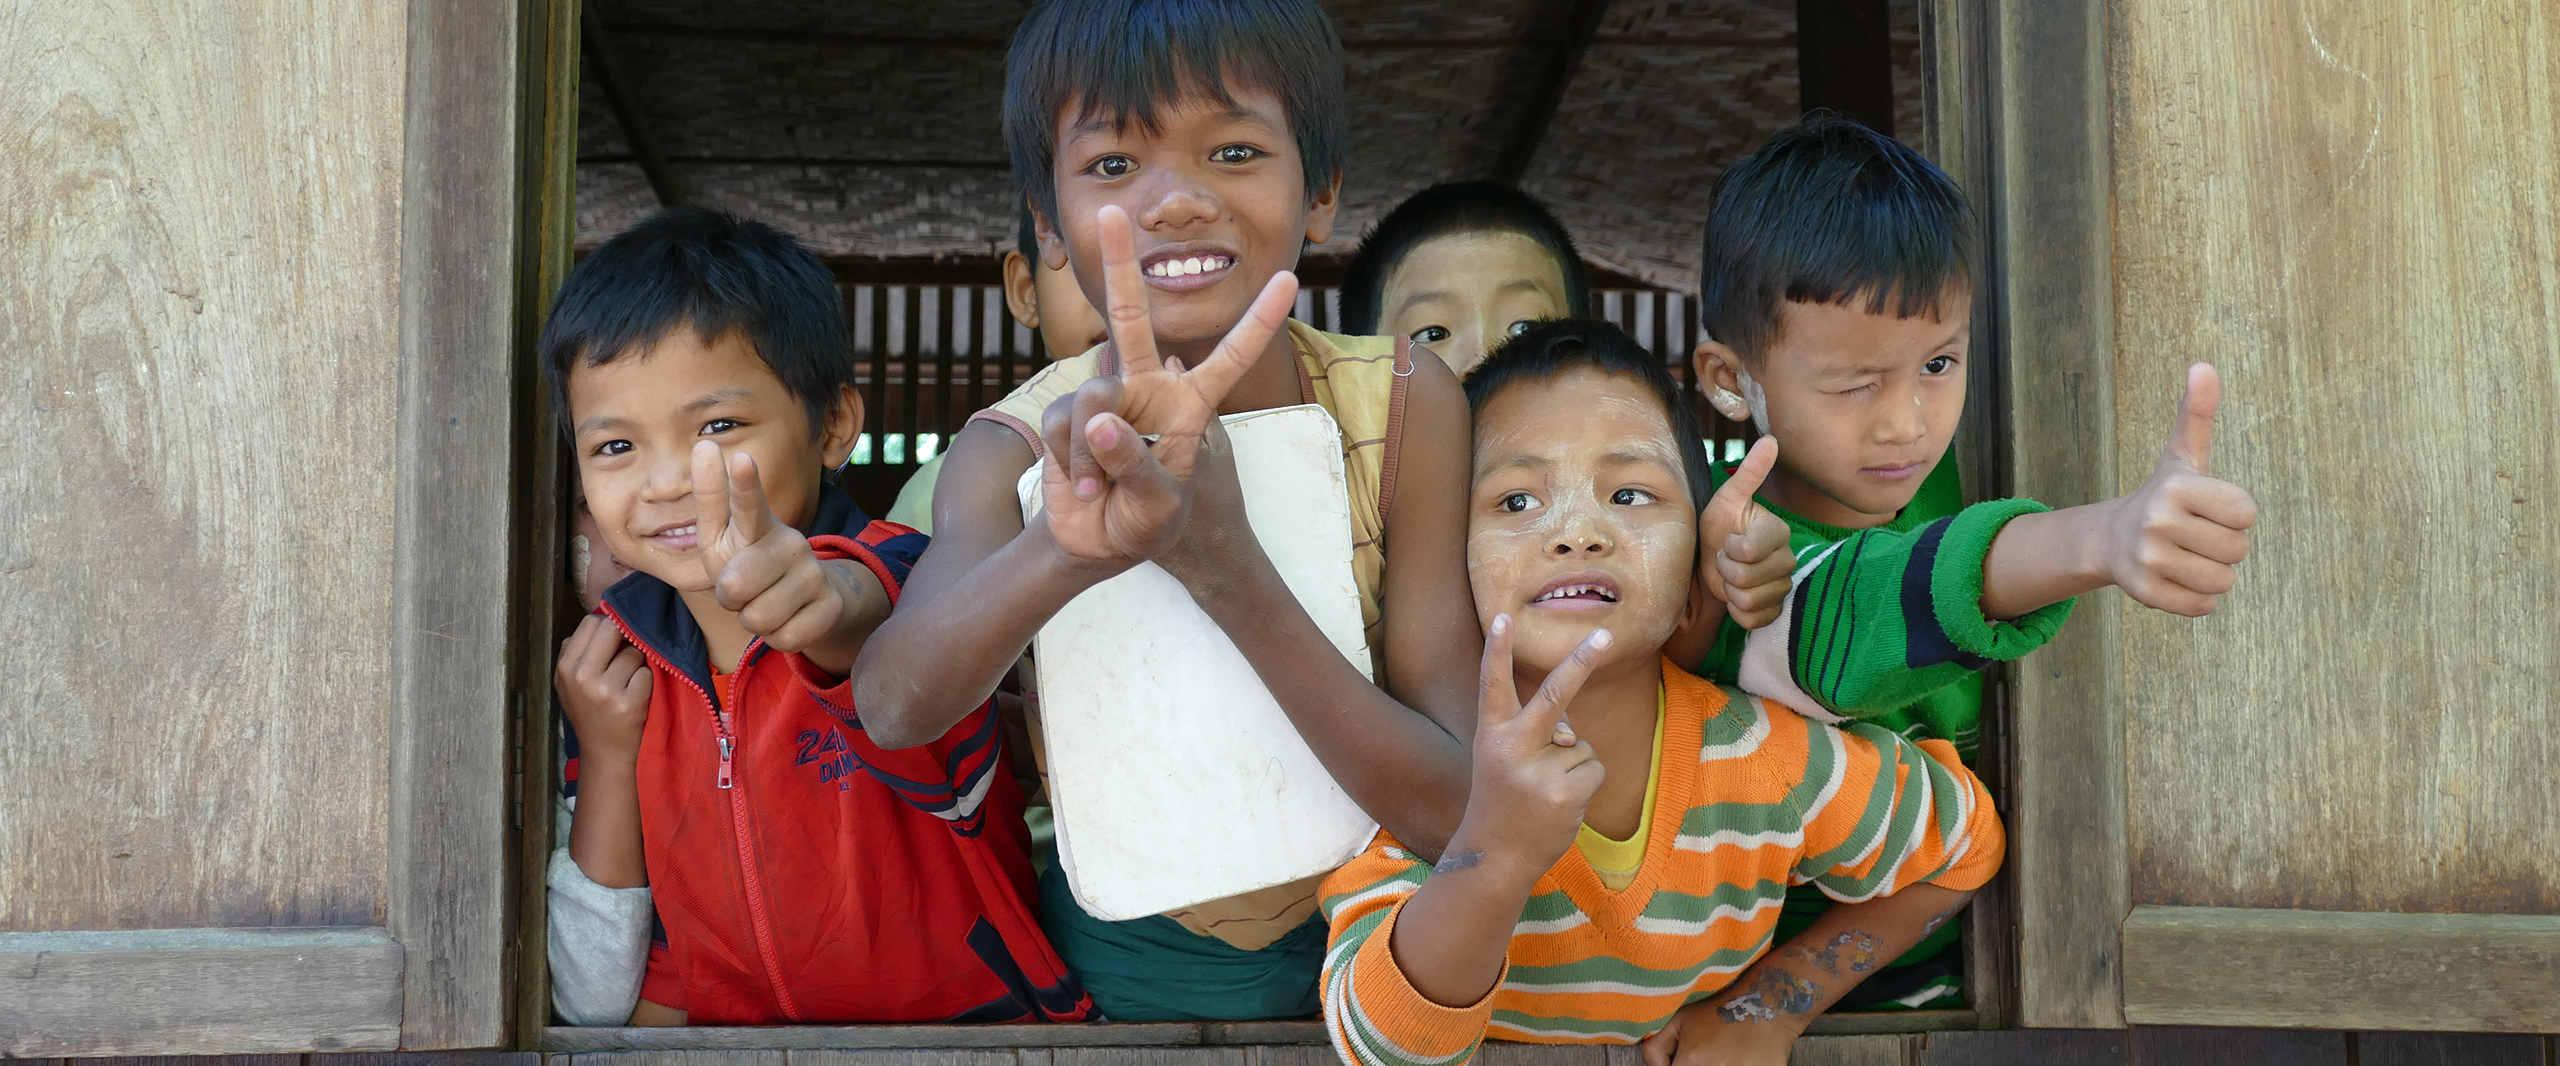 Kinder der Taung Ba Schule in Myanmar